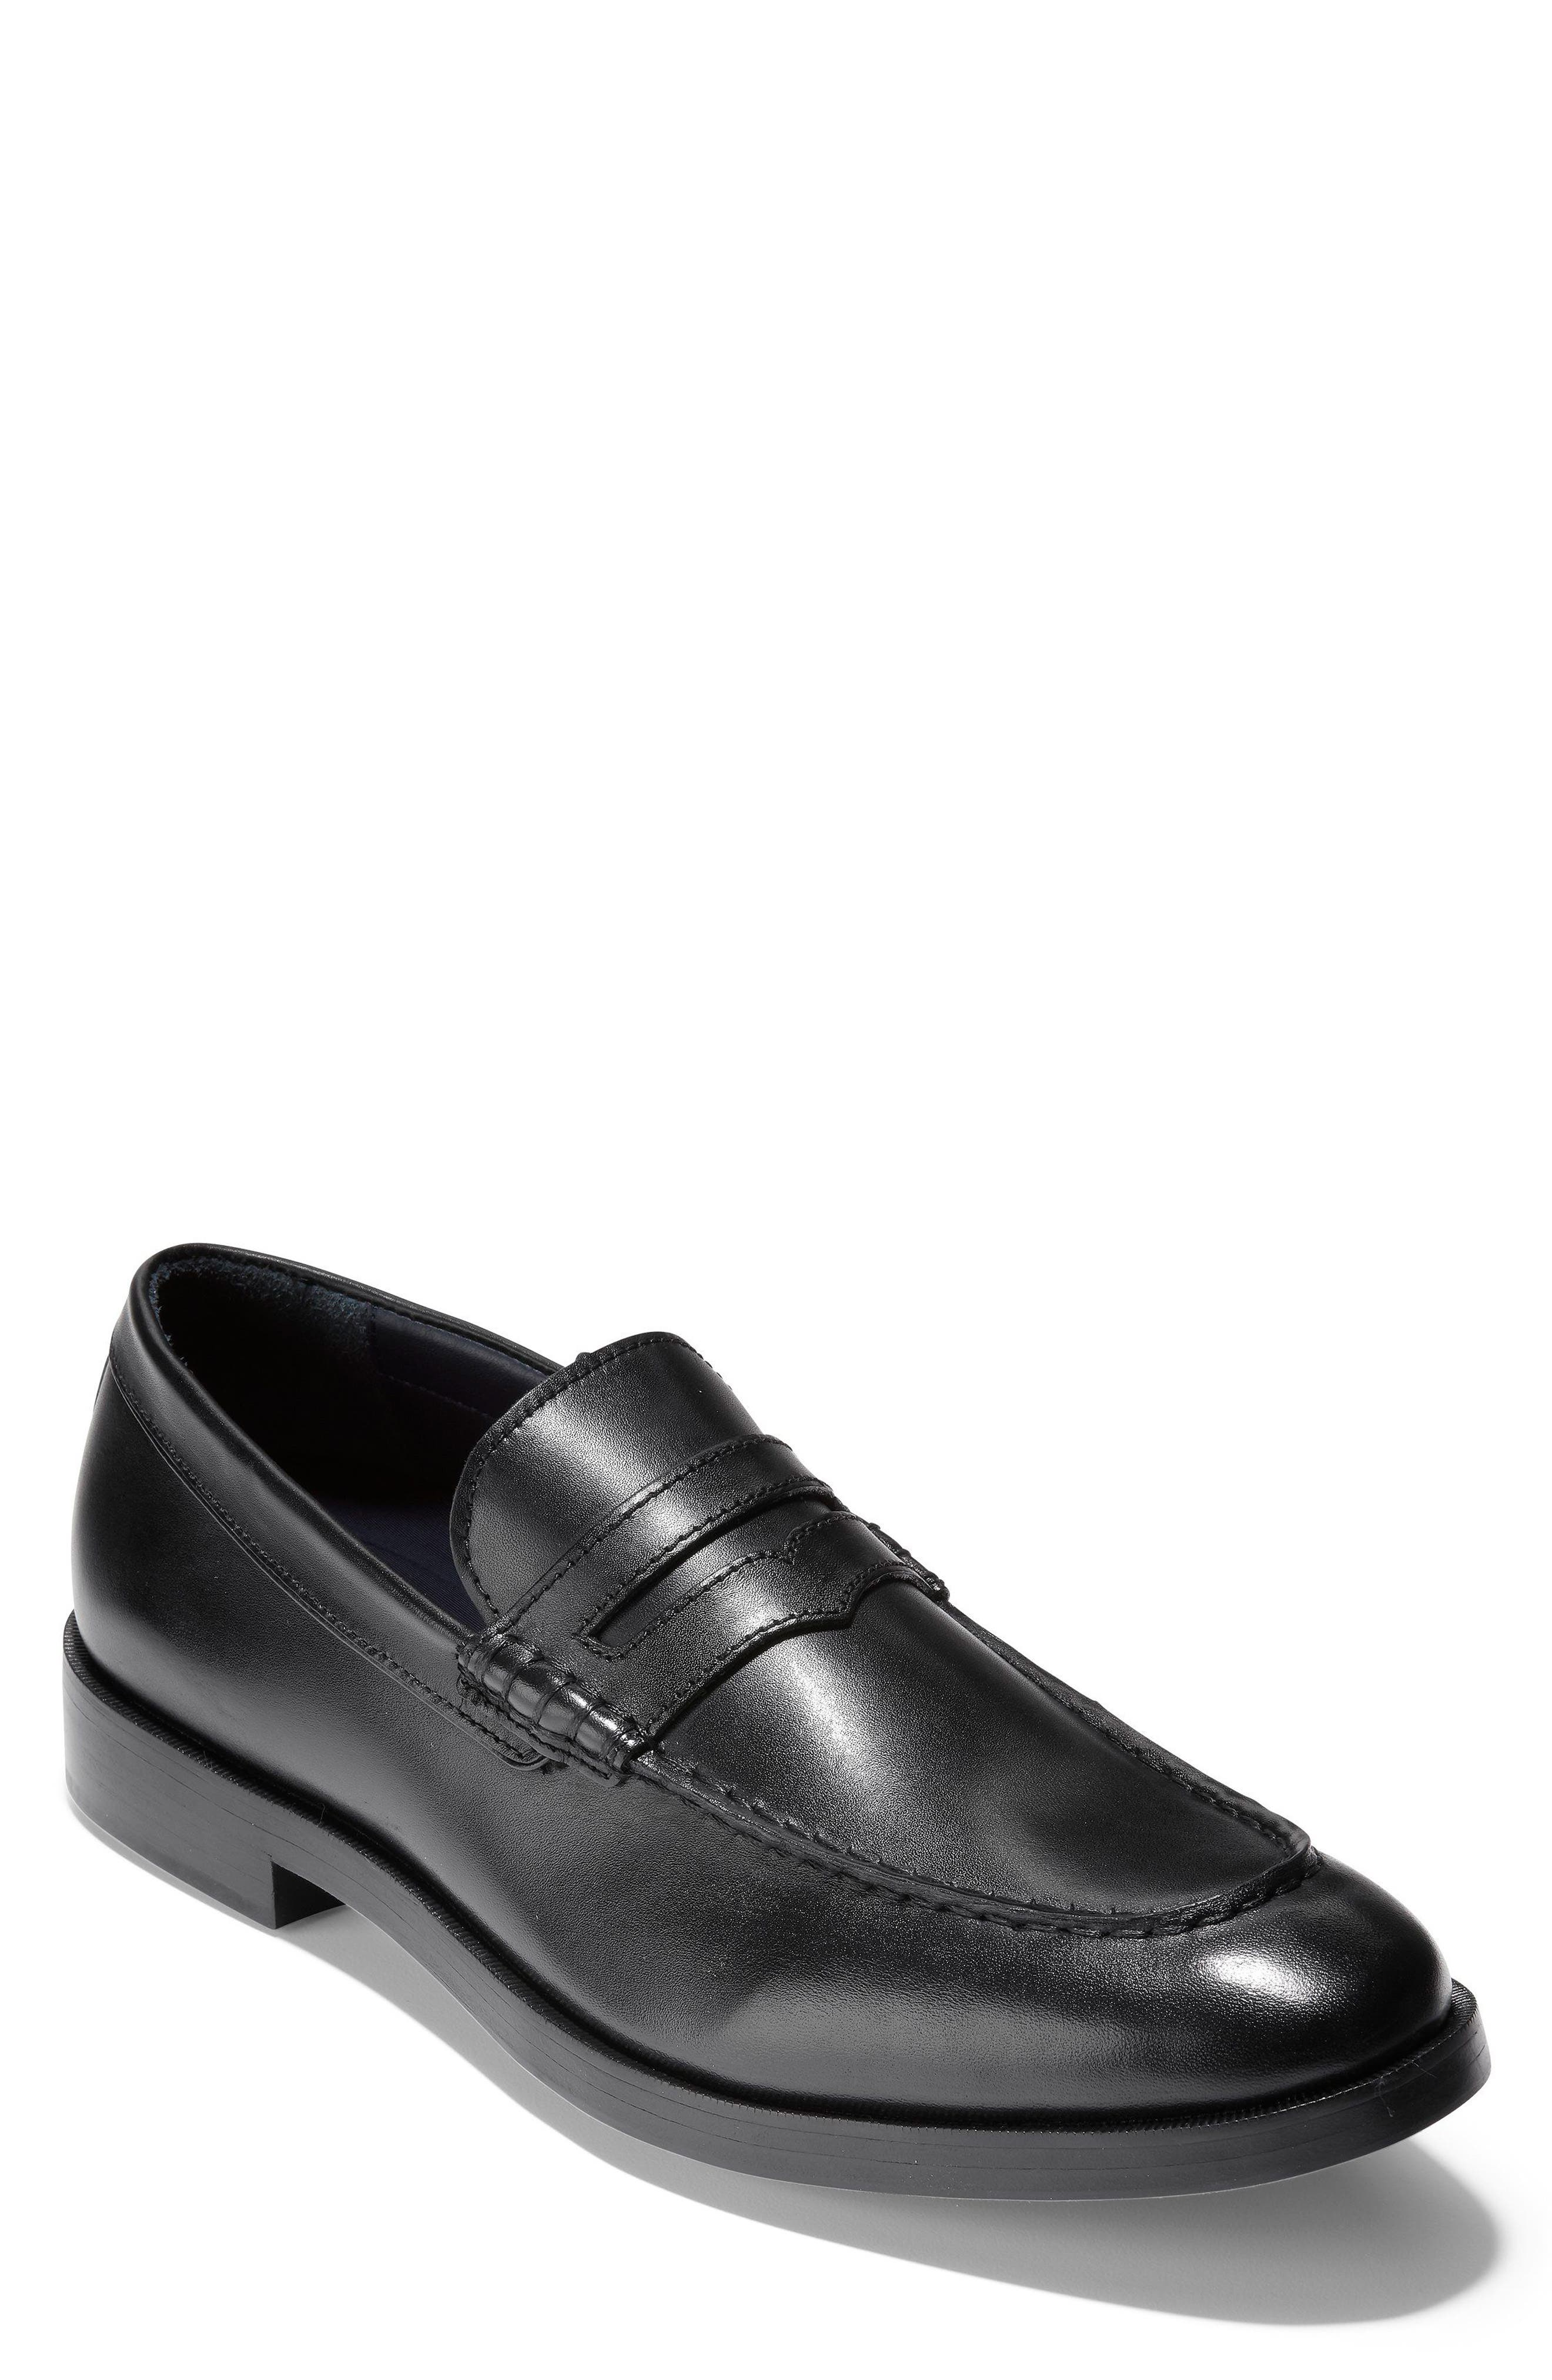 Hamilton Grand Penny Loafer,                         Main,                         color, Black Leather